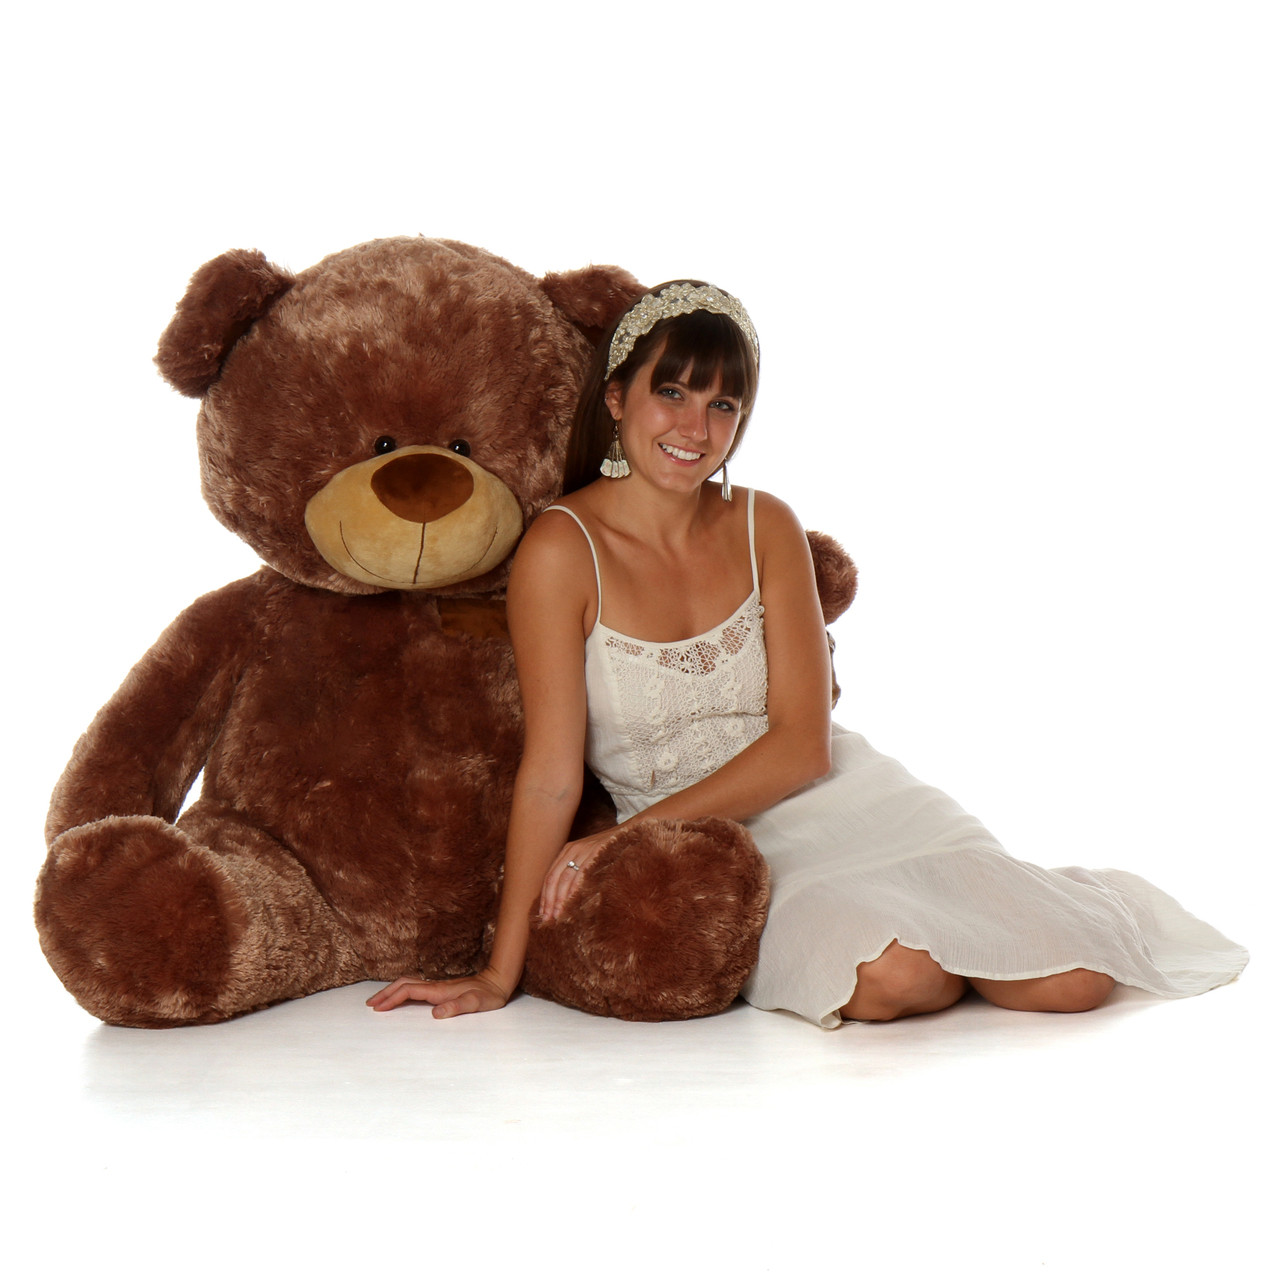 Giant 4 Foot Teddy Bear Shags Sitting Position